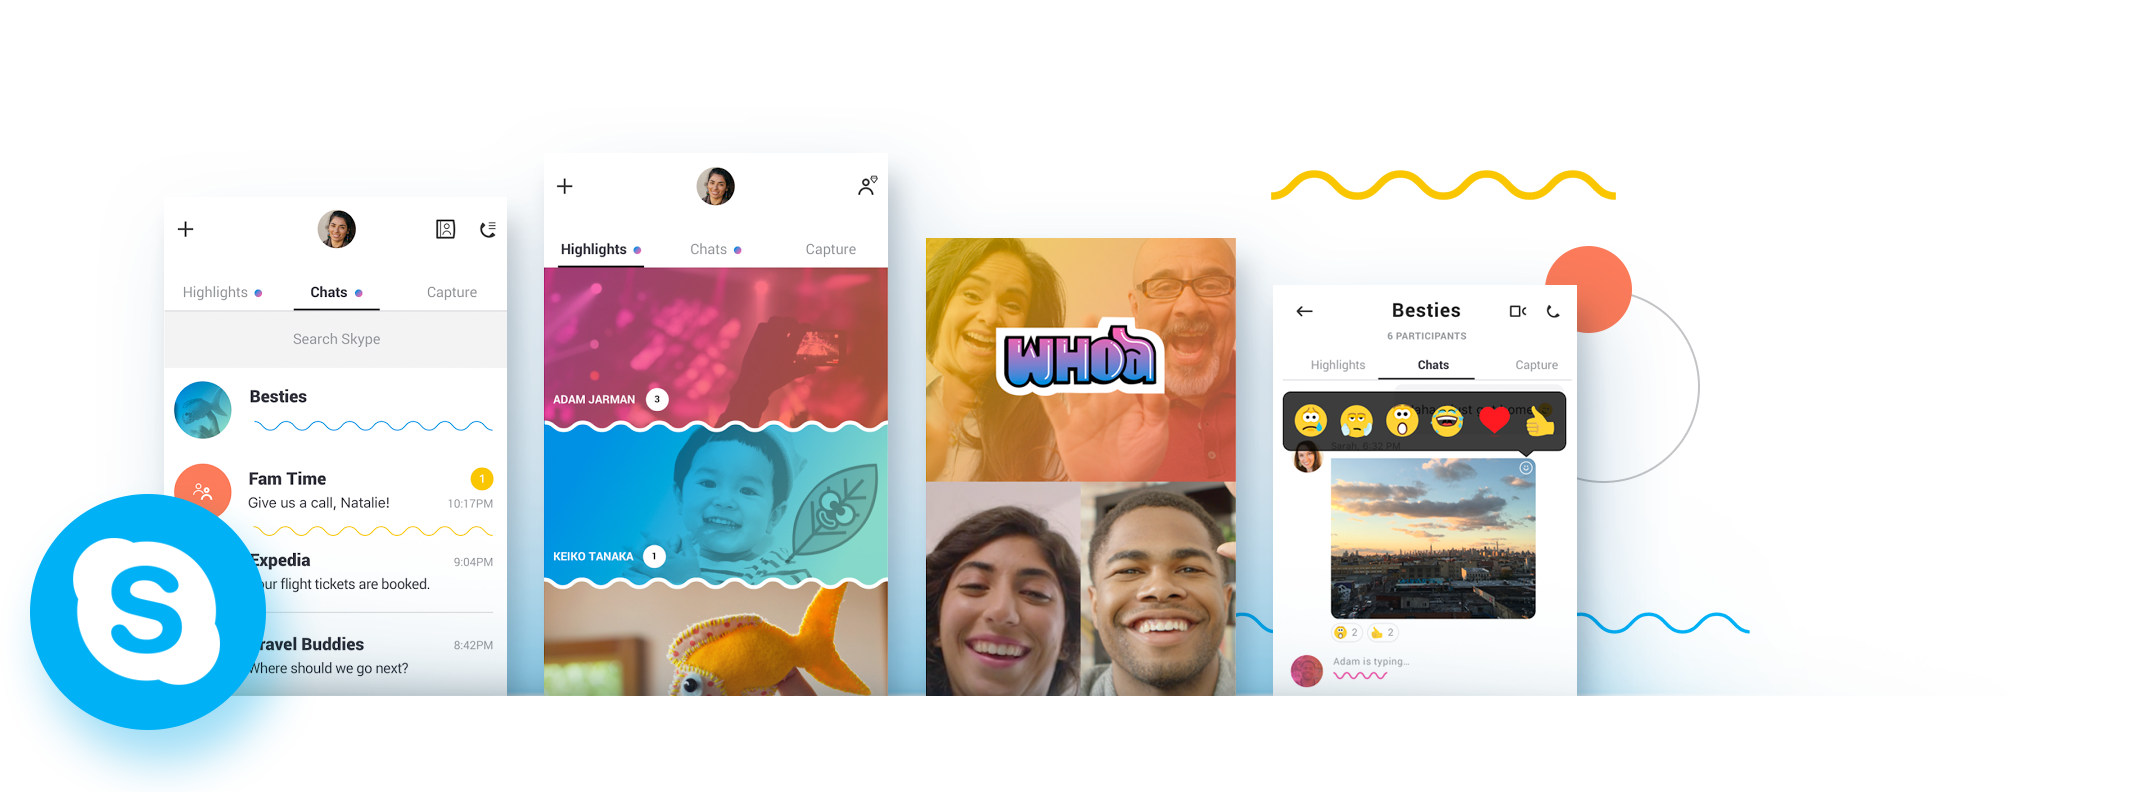 Skype React Native App